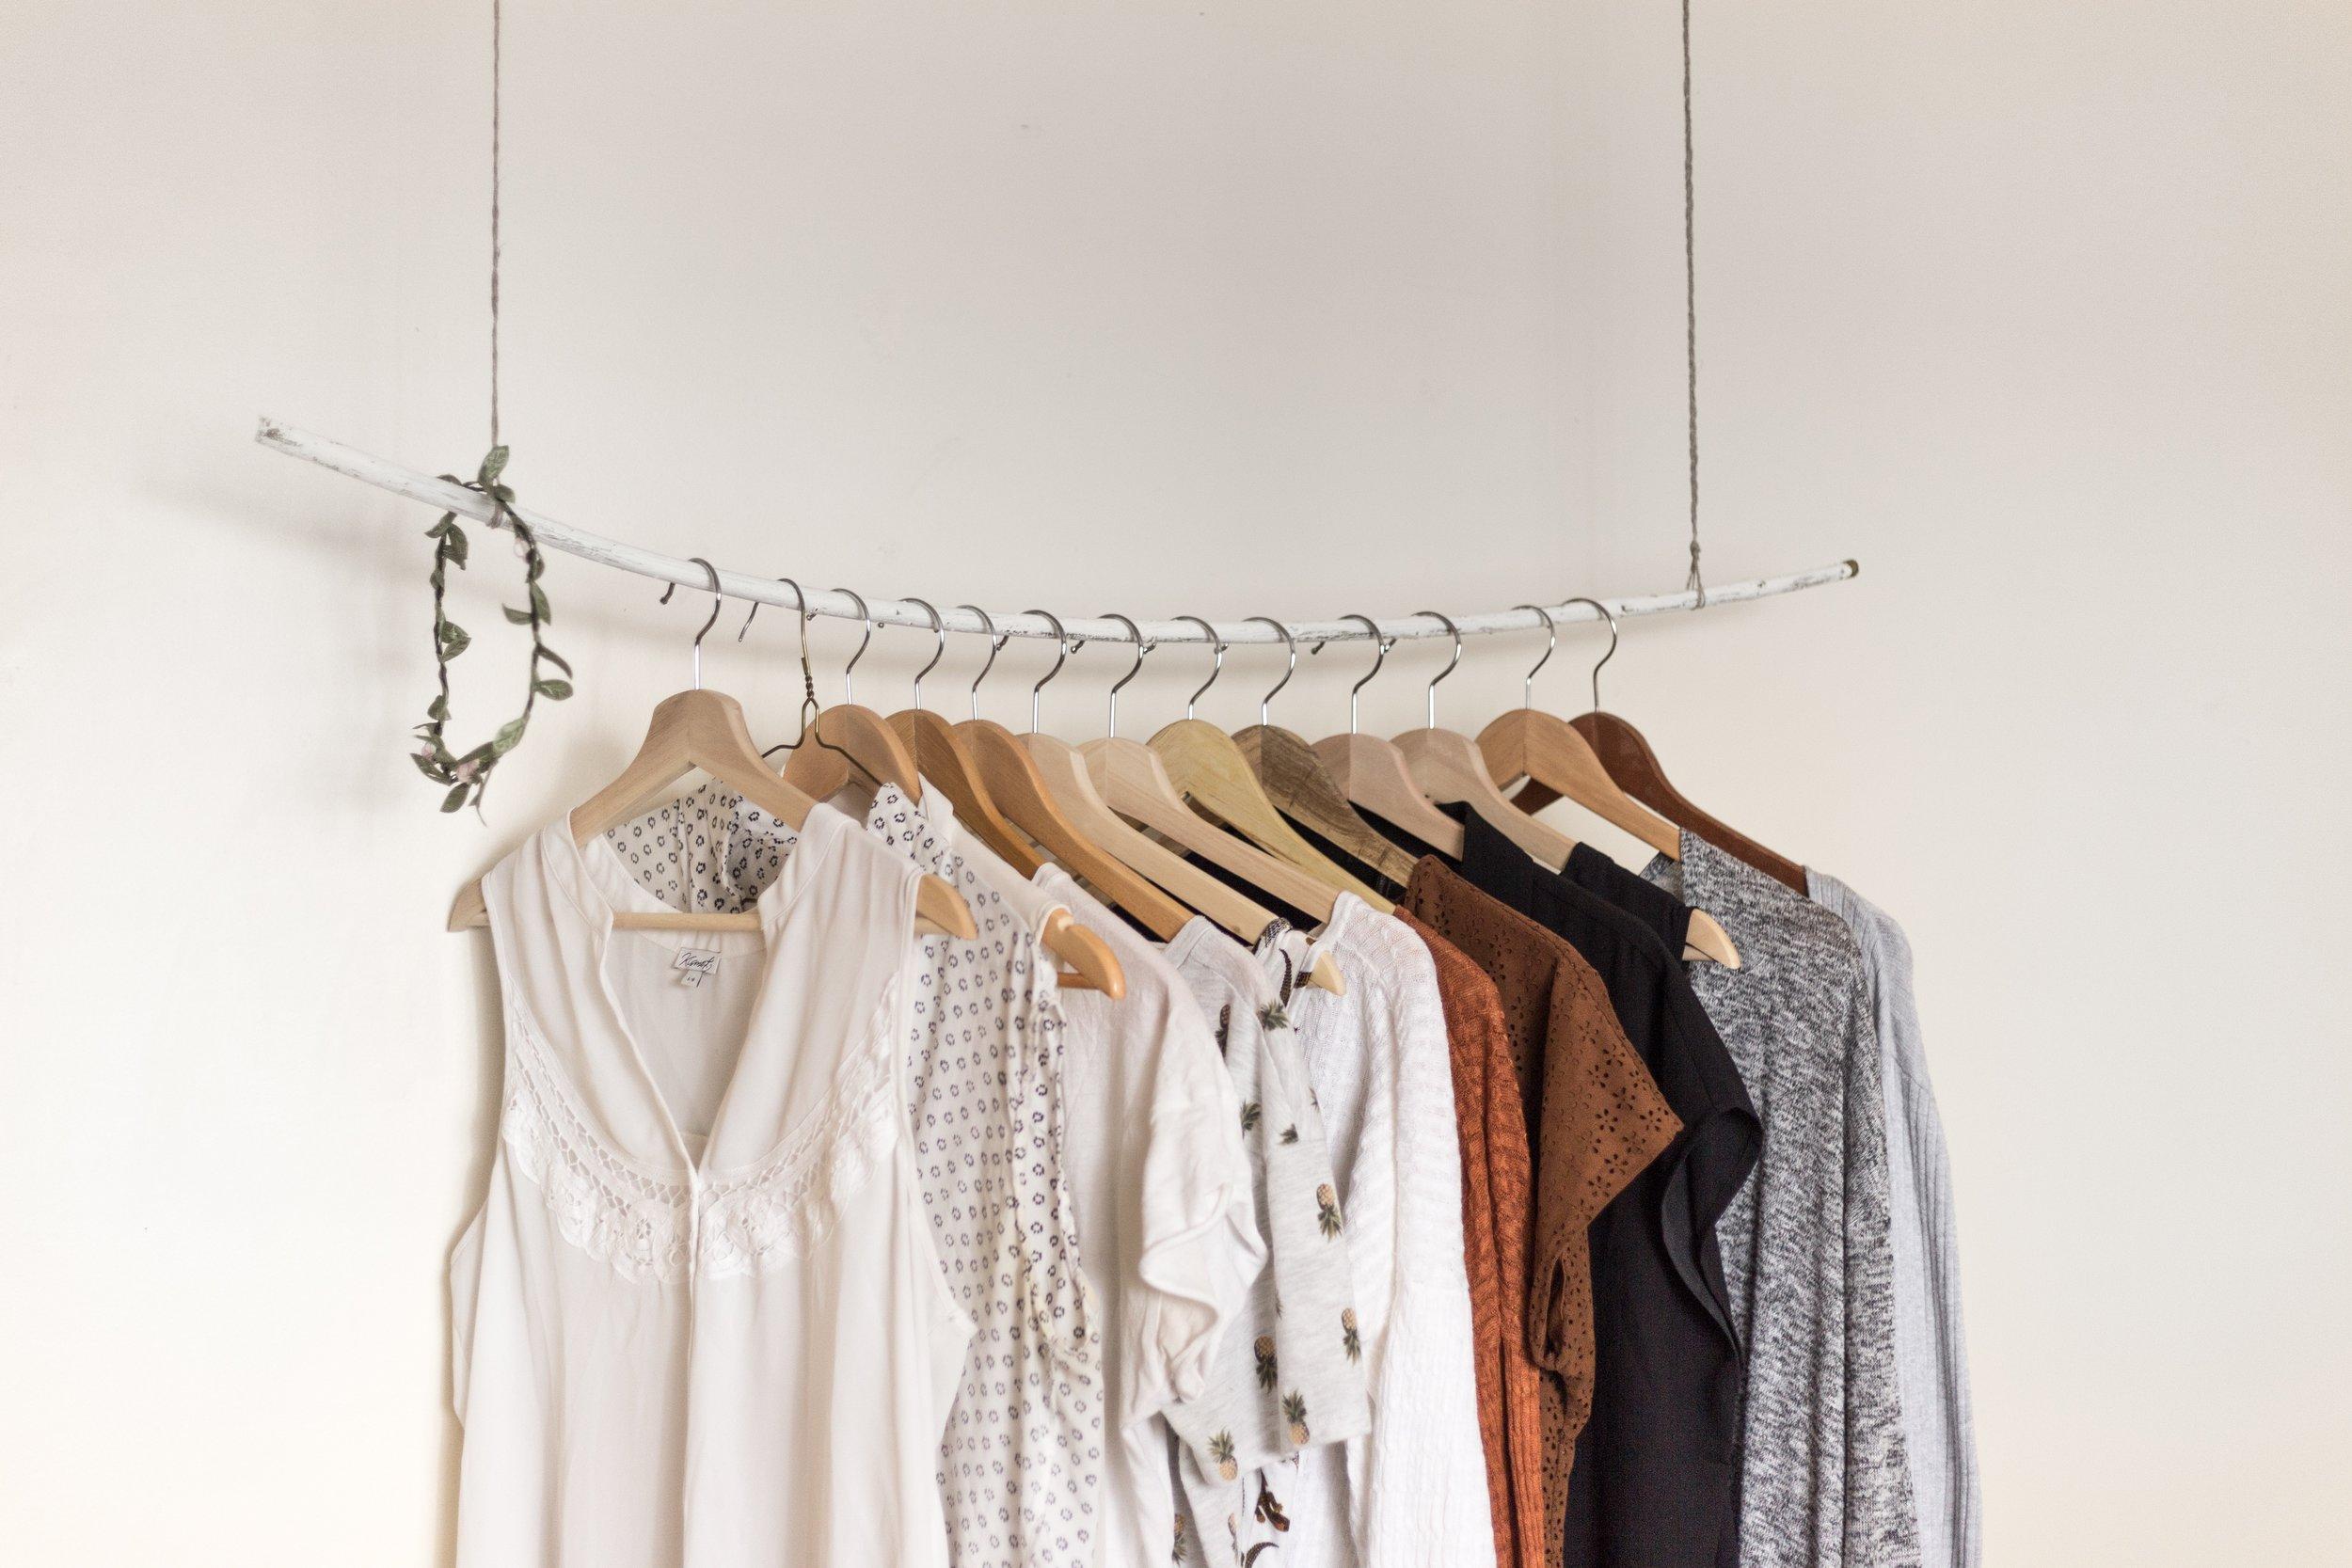 hangers.jpg